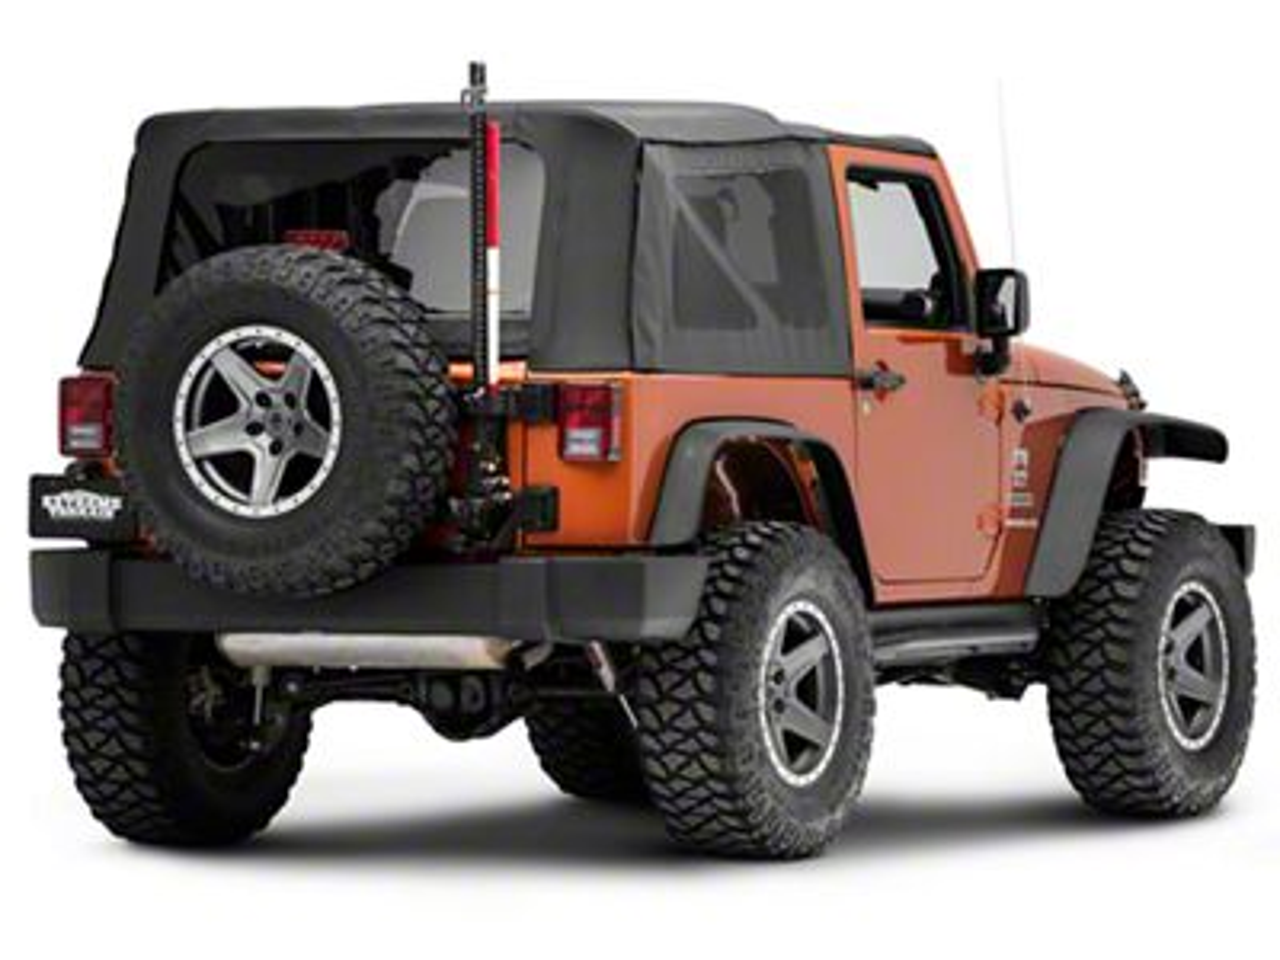 Rugged Ridge Off-Road Jack Mounting Bracket Kit (07-18 Jeep Wrangler JK)